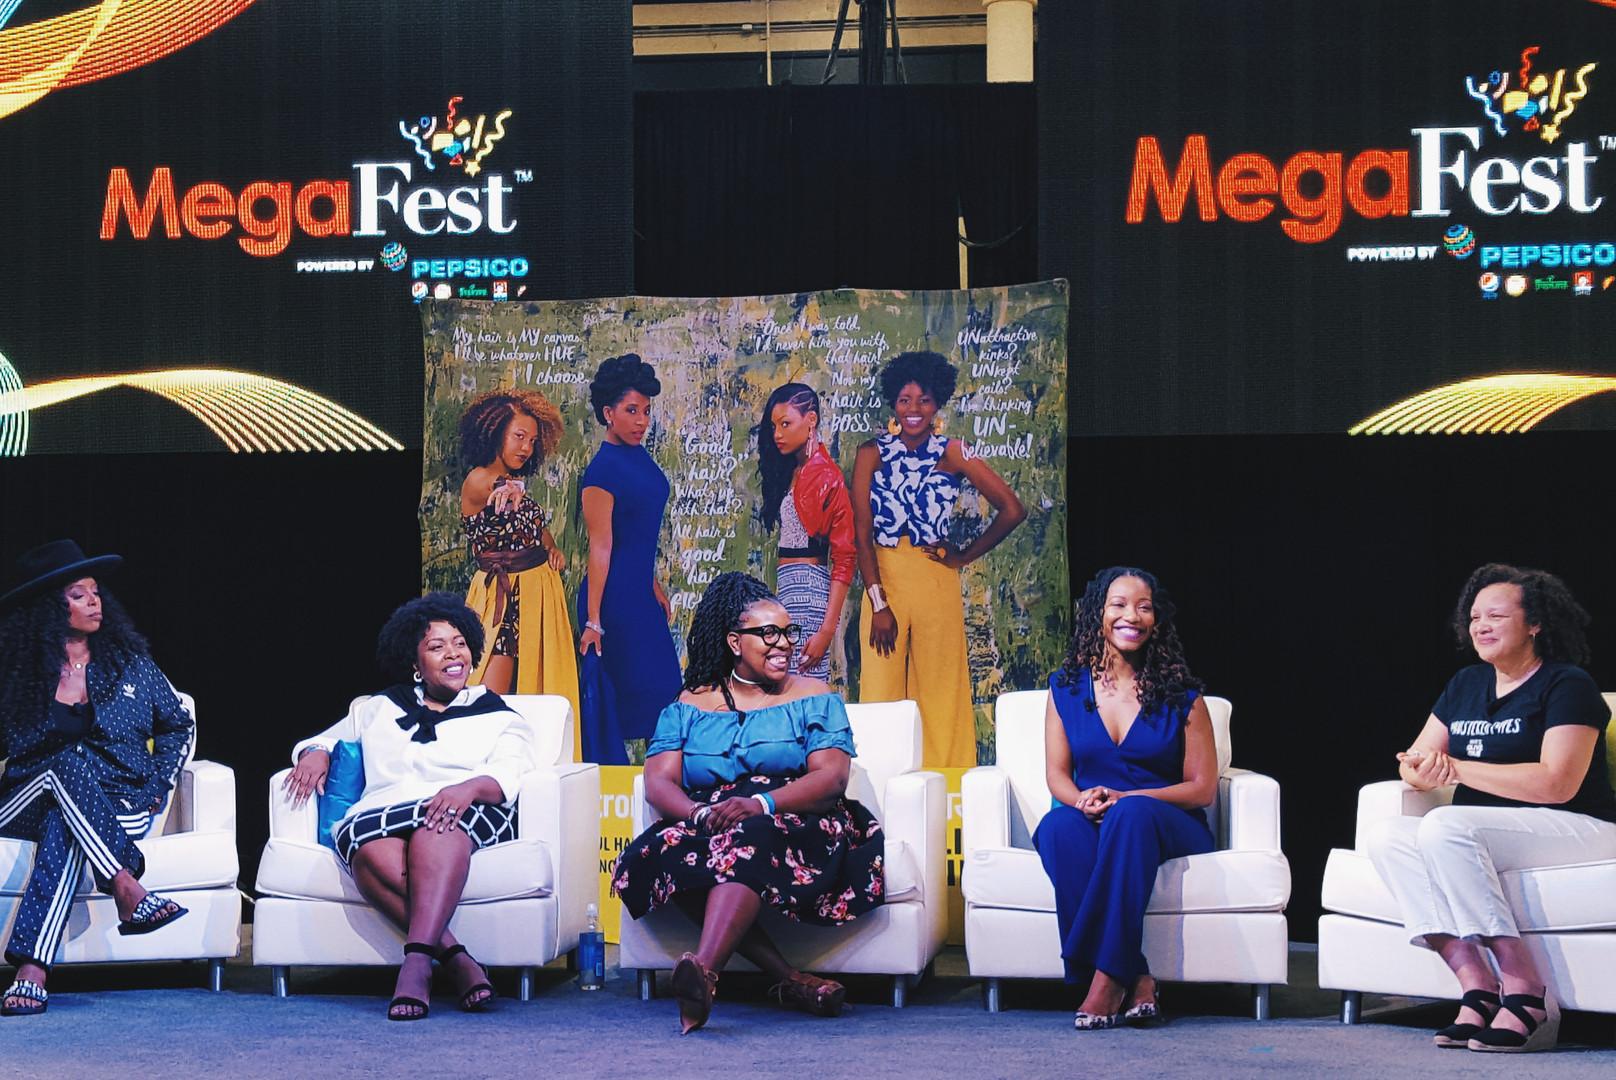 T.D. Jakes MegaFest Conference